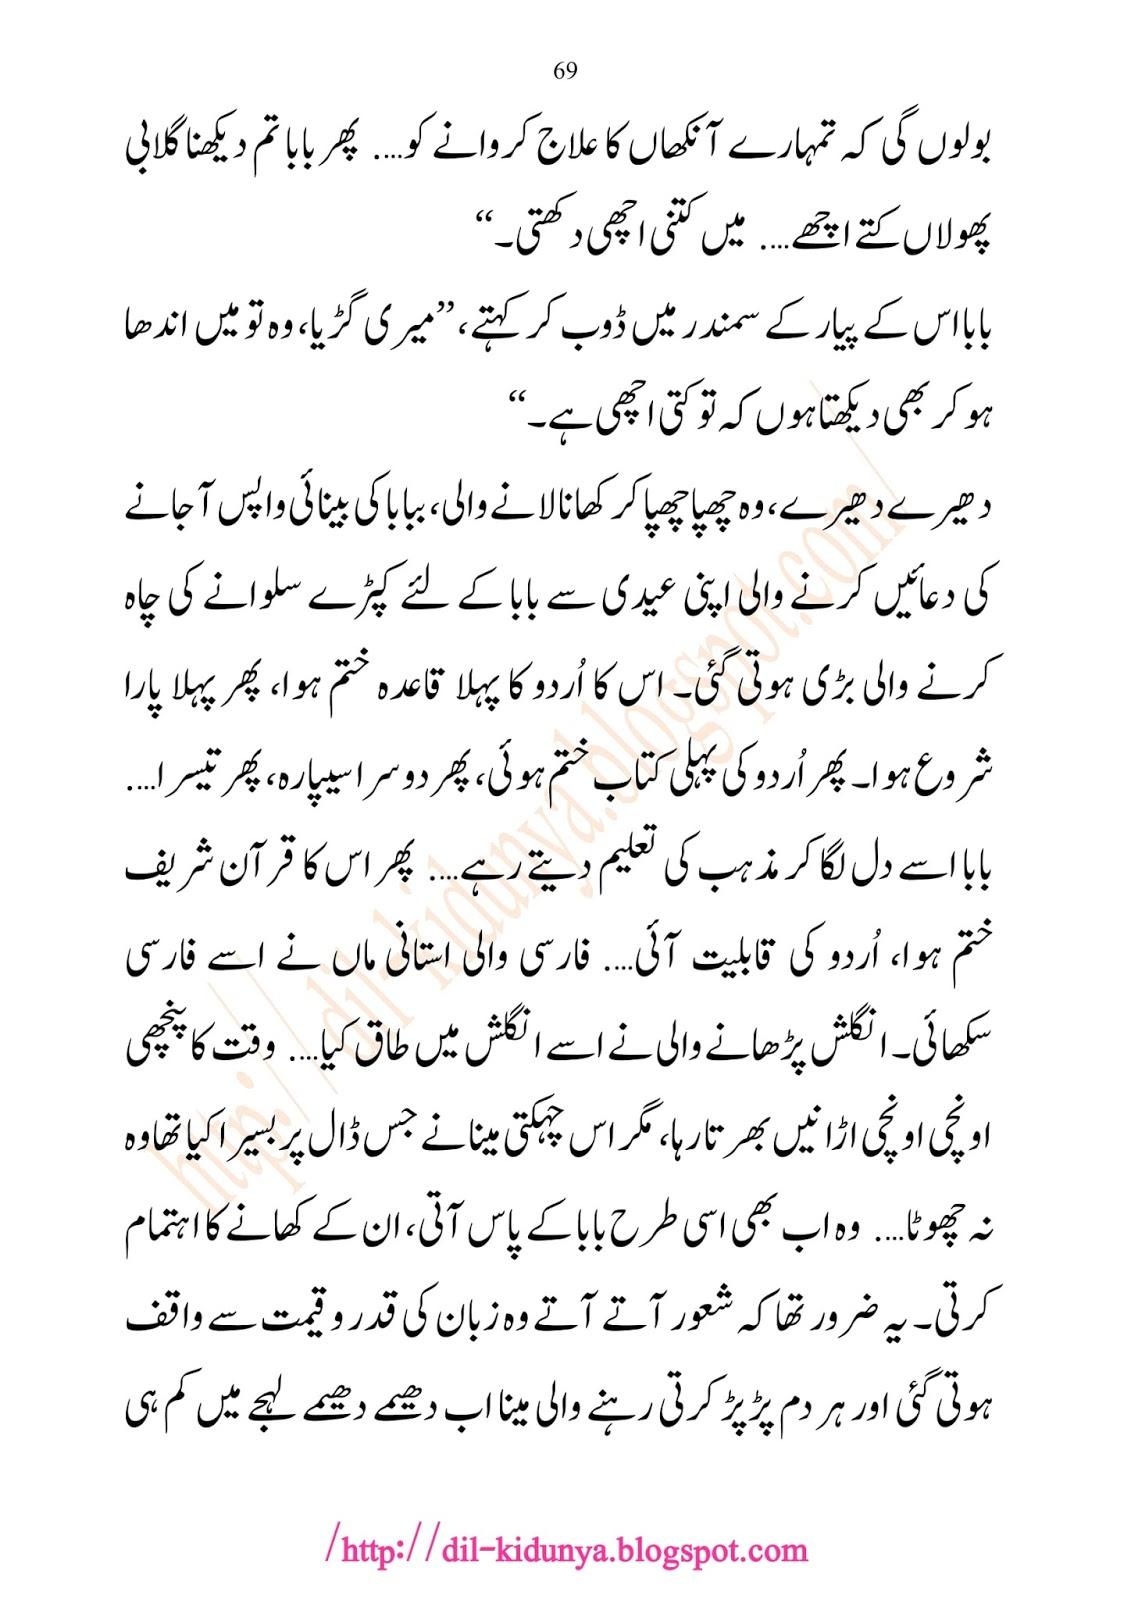 Dil Ki Dunya Jannati Jora Famous Urdu Short Story